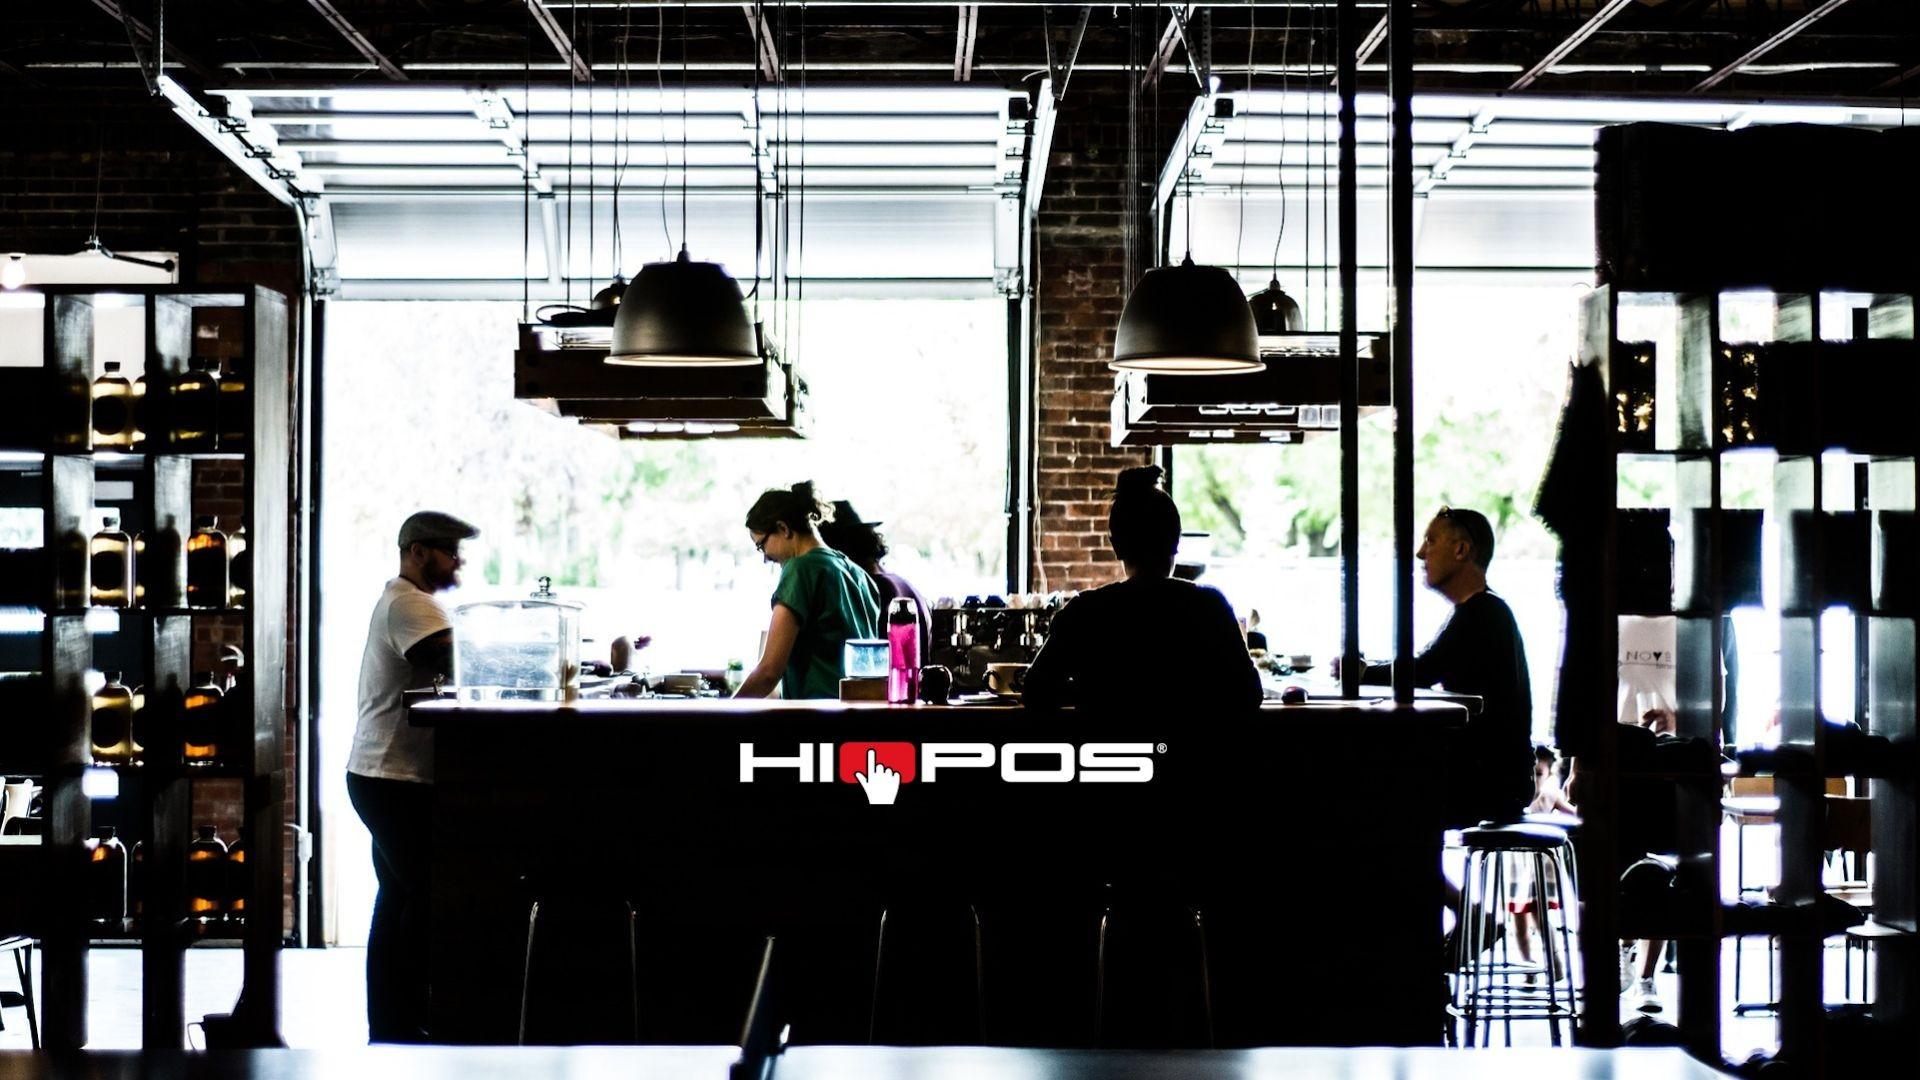 Hiopos Restaurantes